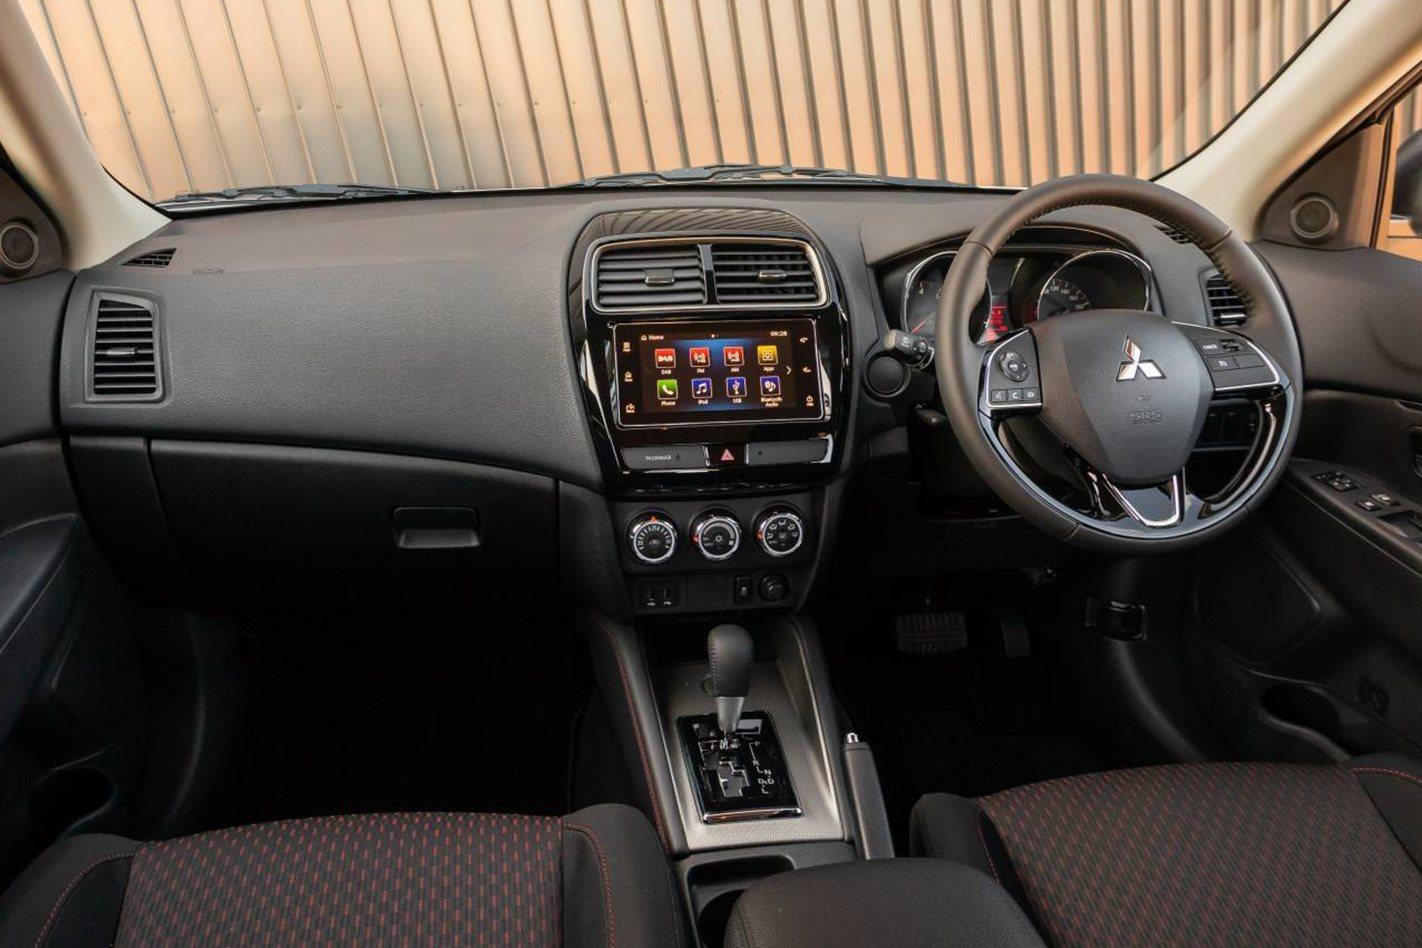 Mitsubishi asx 2019 model